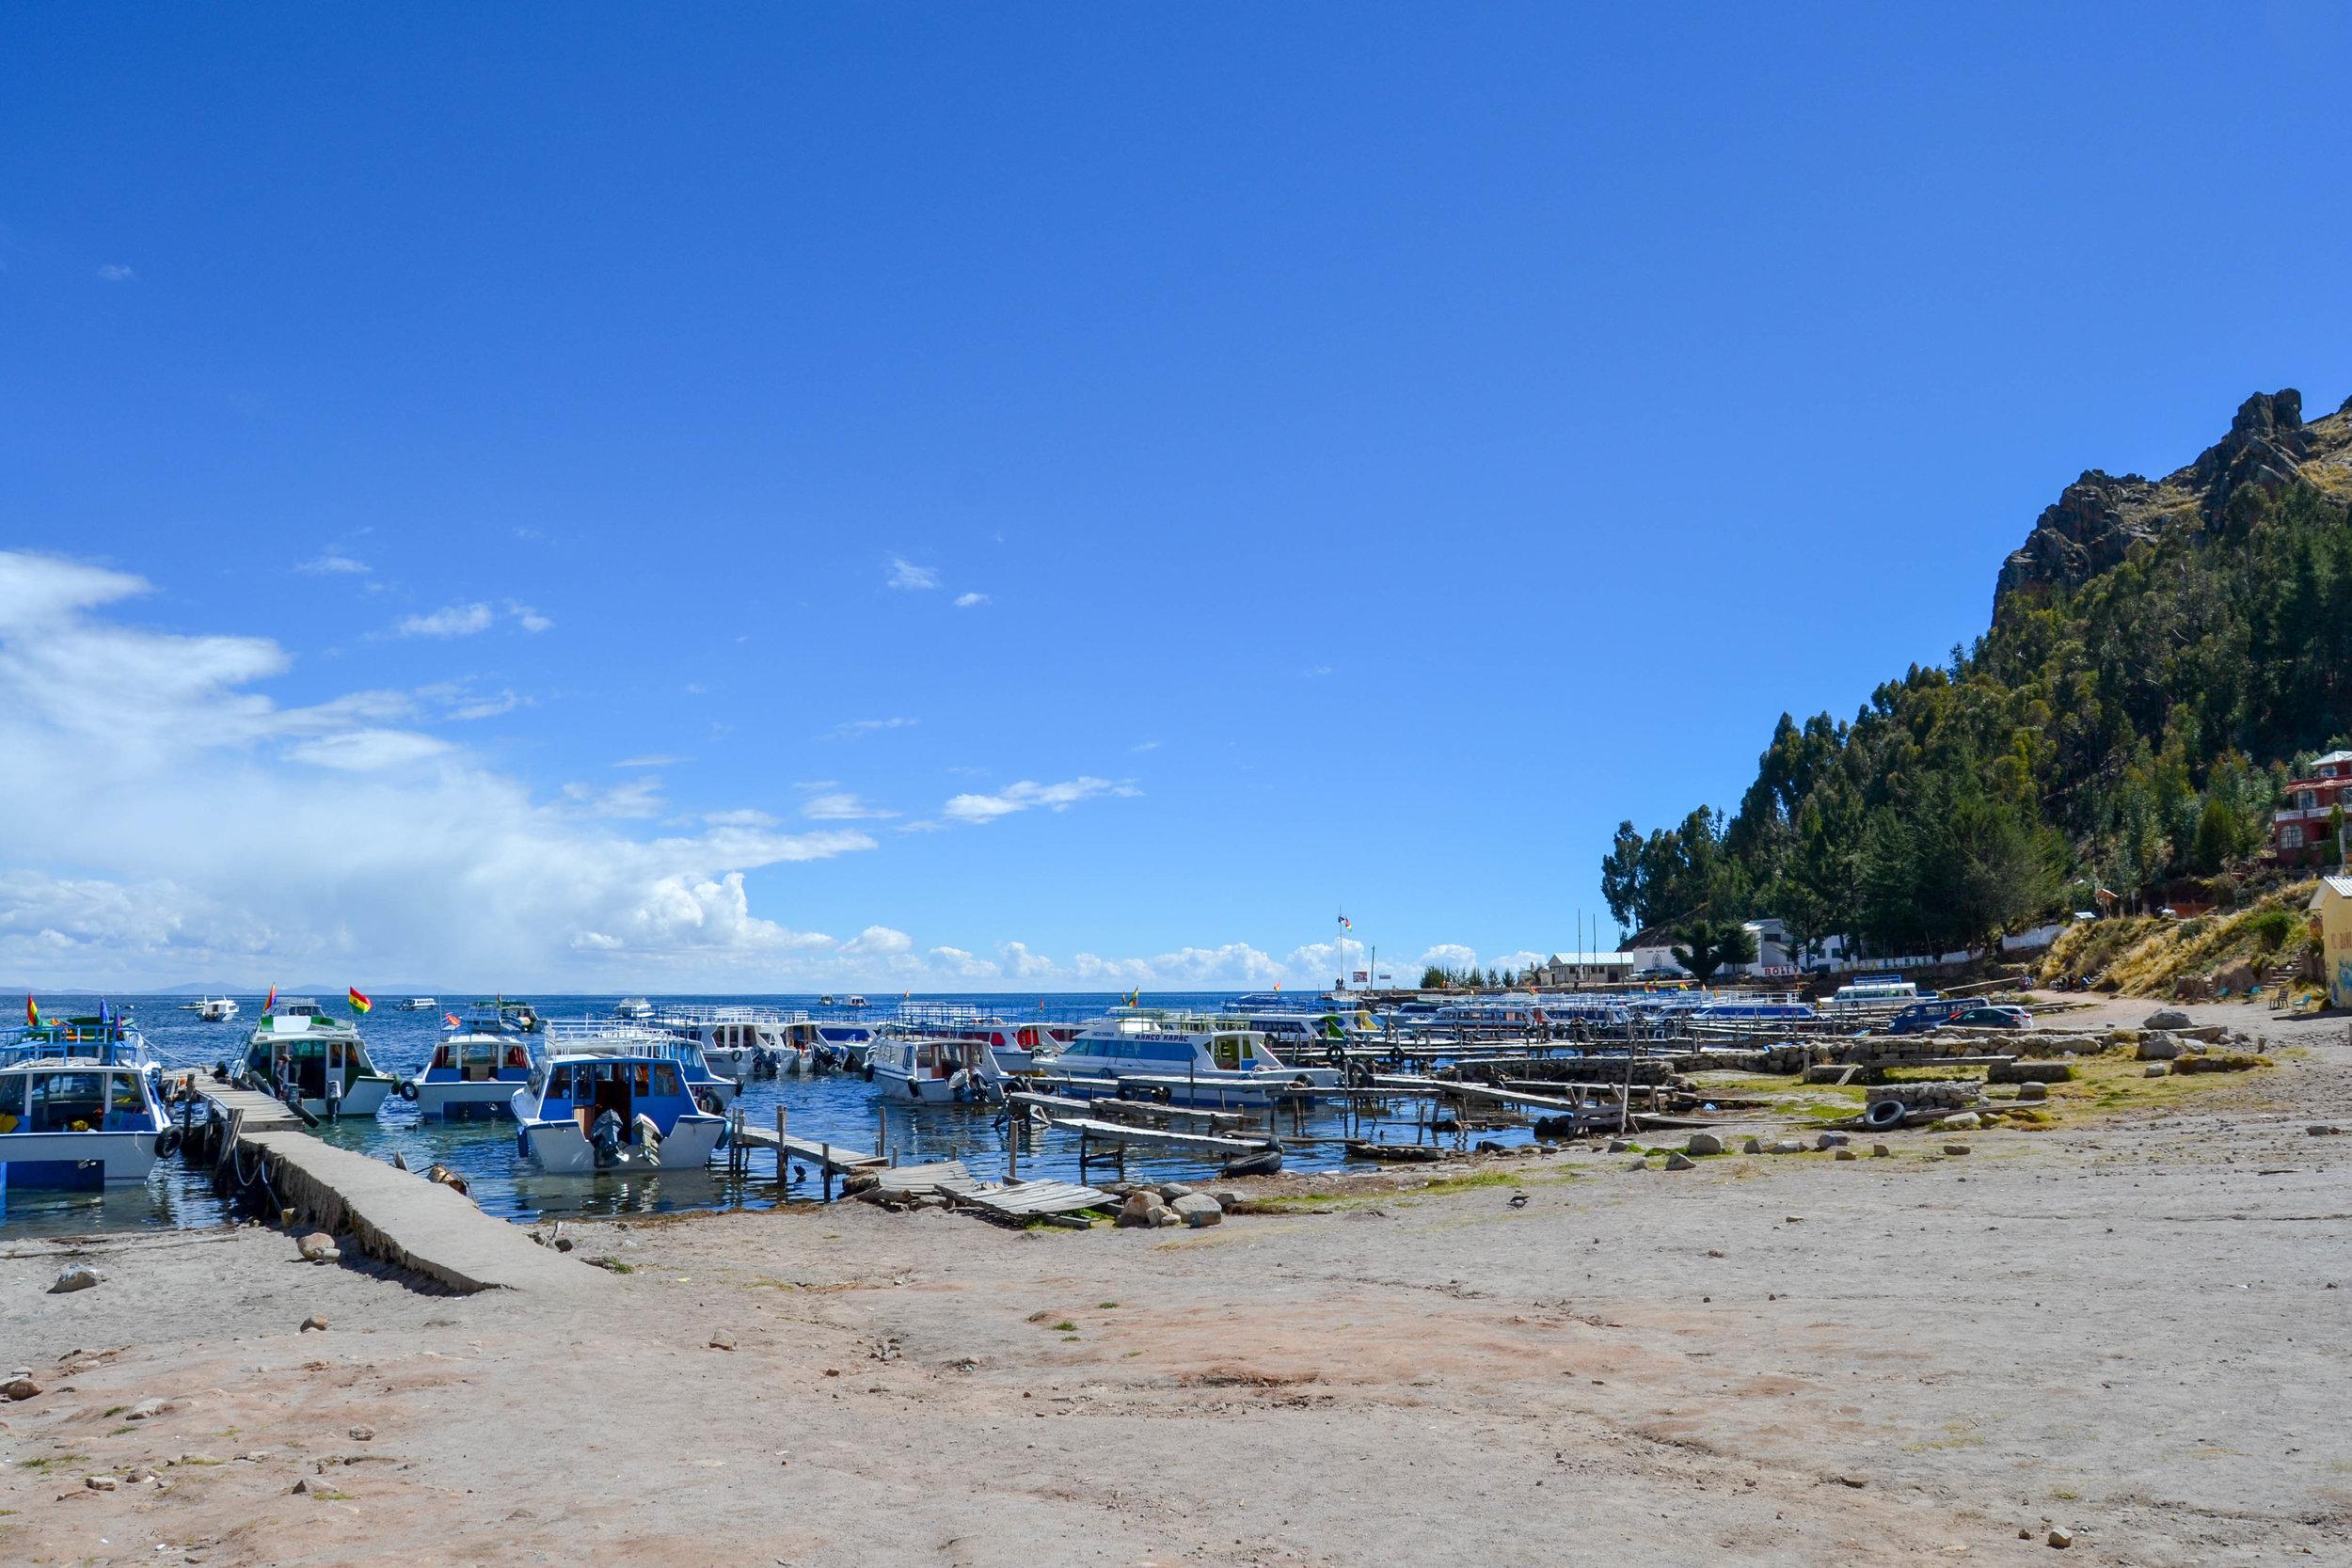 Shores of Lake Titicaca